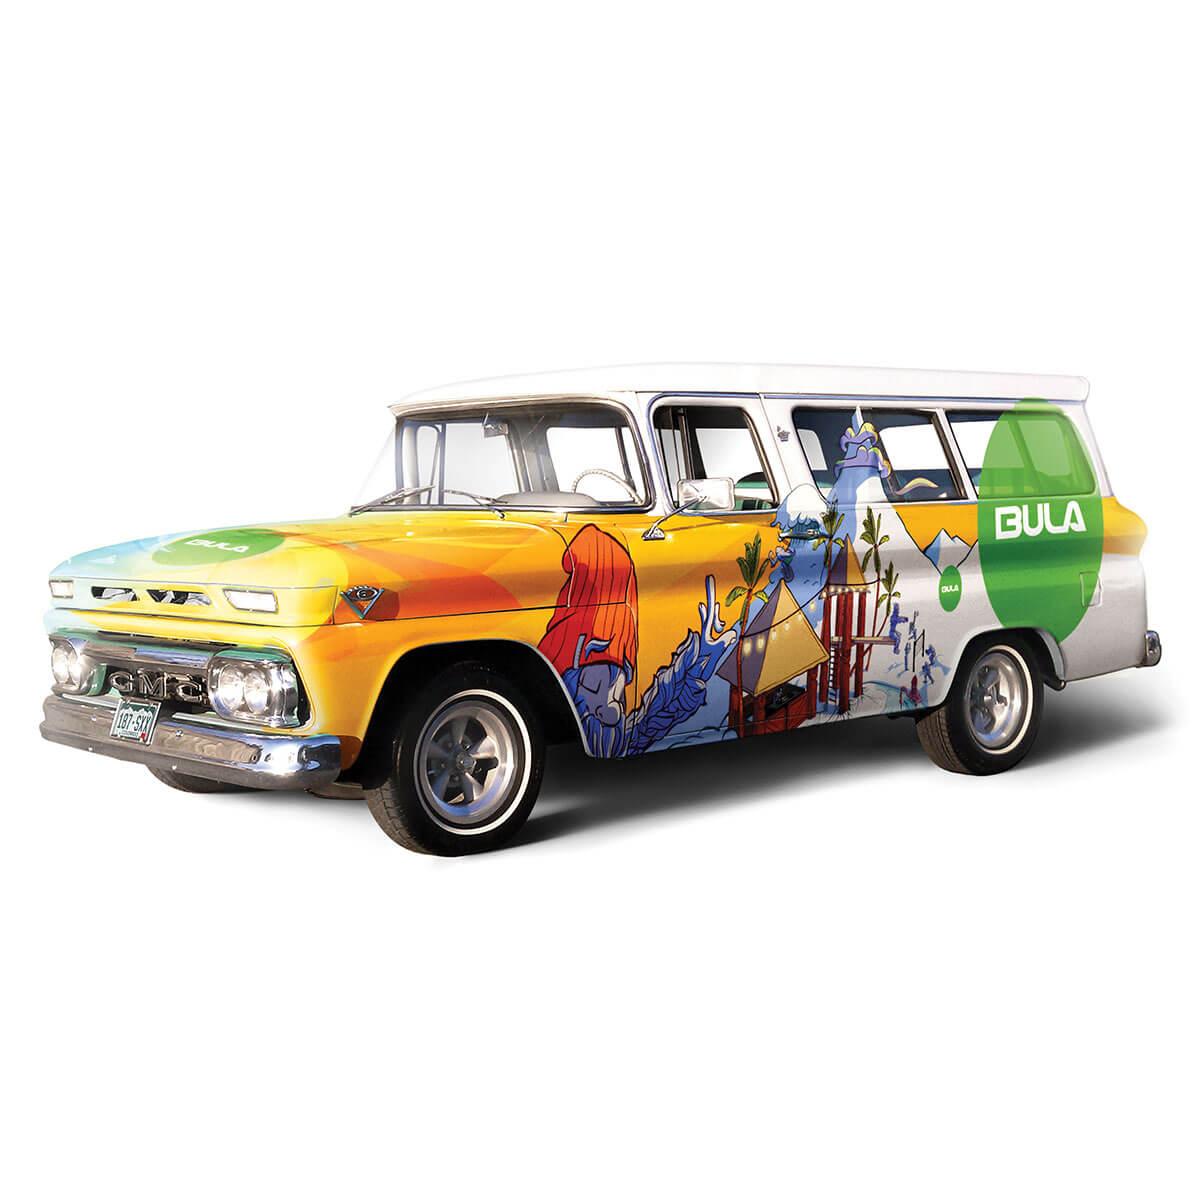 Branding, Product Catalog & Truck Wrap Hero Image